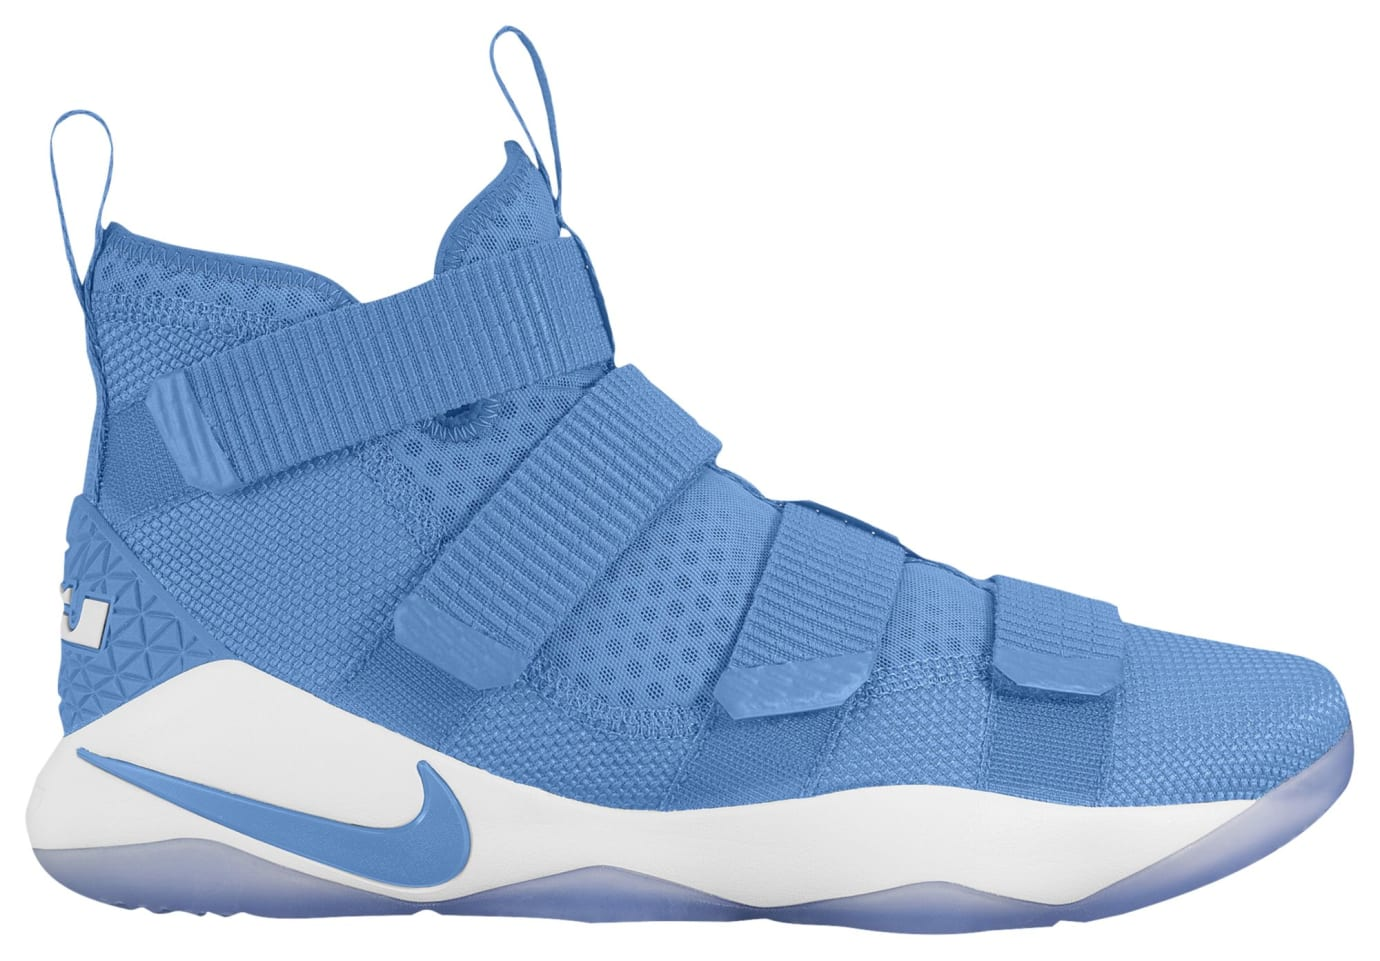 Nike LeBron Soldier 11 TB Coast Blue